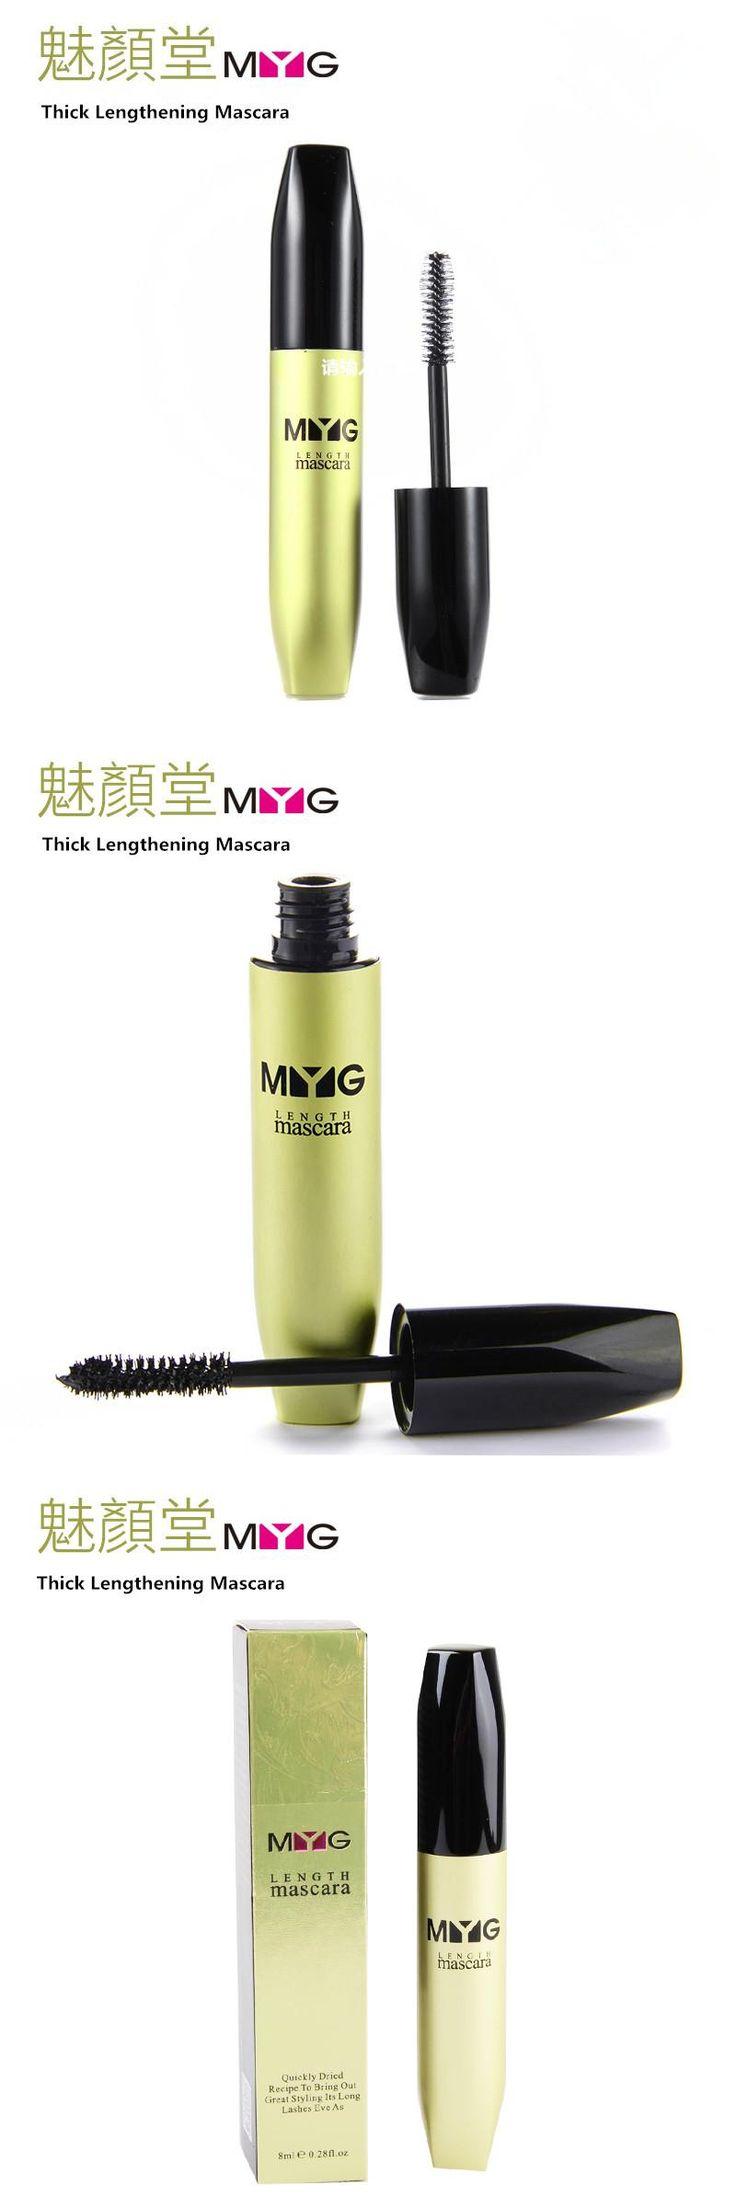 [Visit to Buy] The brand MYG eyebrow mascara , eyebrow enhancer cosmetics colossal mascaras  3d fiber mascara waterproof  lengthening make up #Advertisement